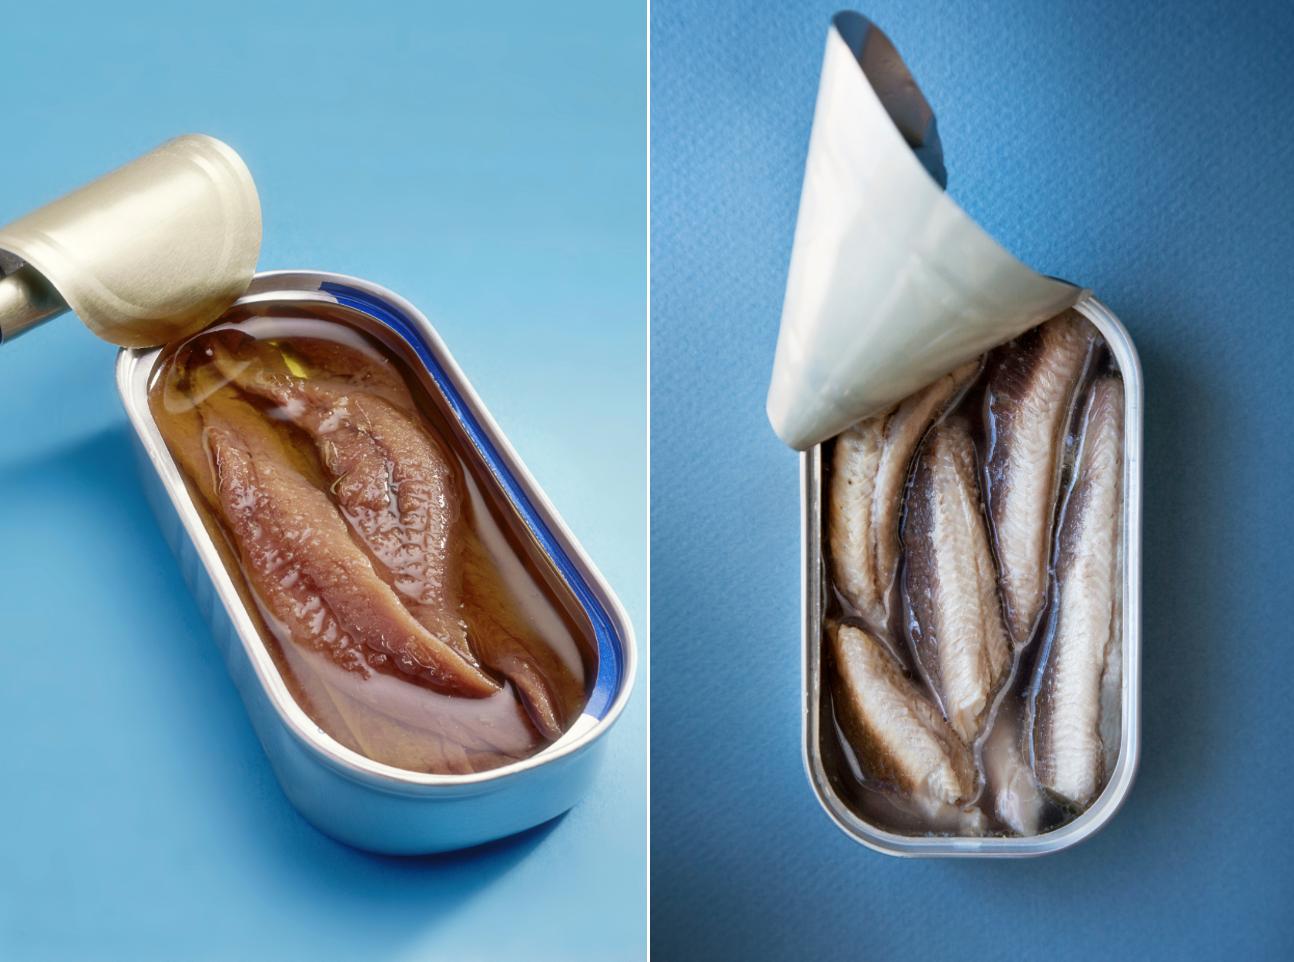 You Can Buy a 3-Pound Bucket of Maldon Salt | Extra Crispy